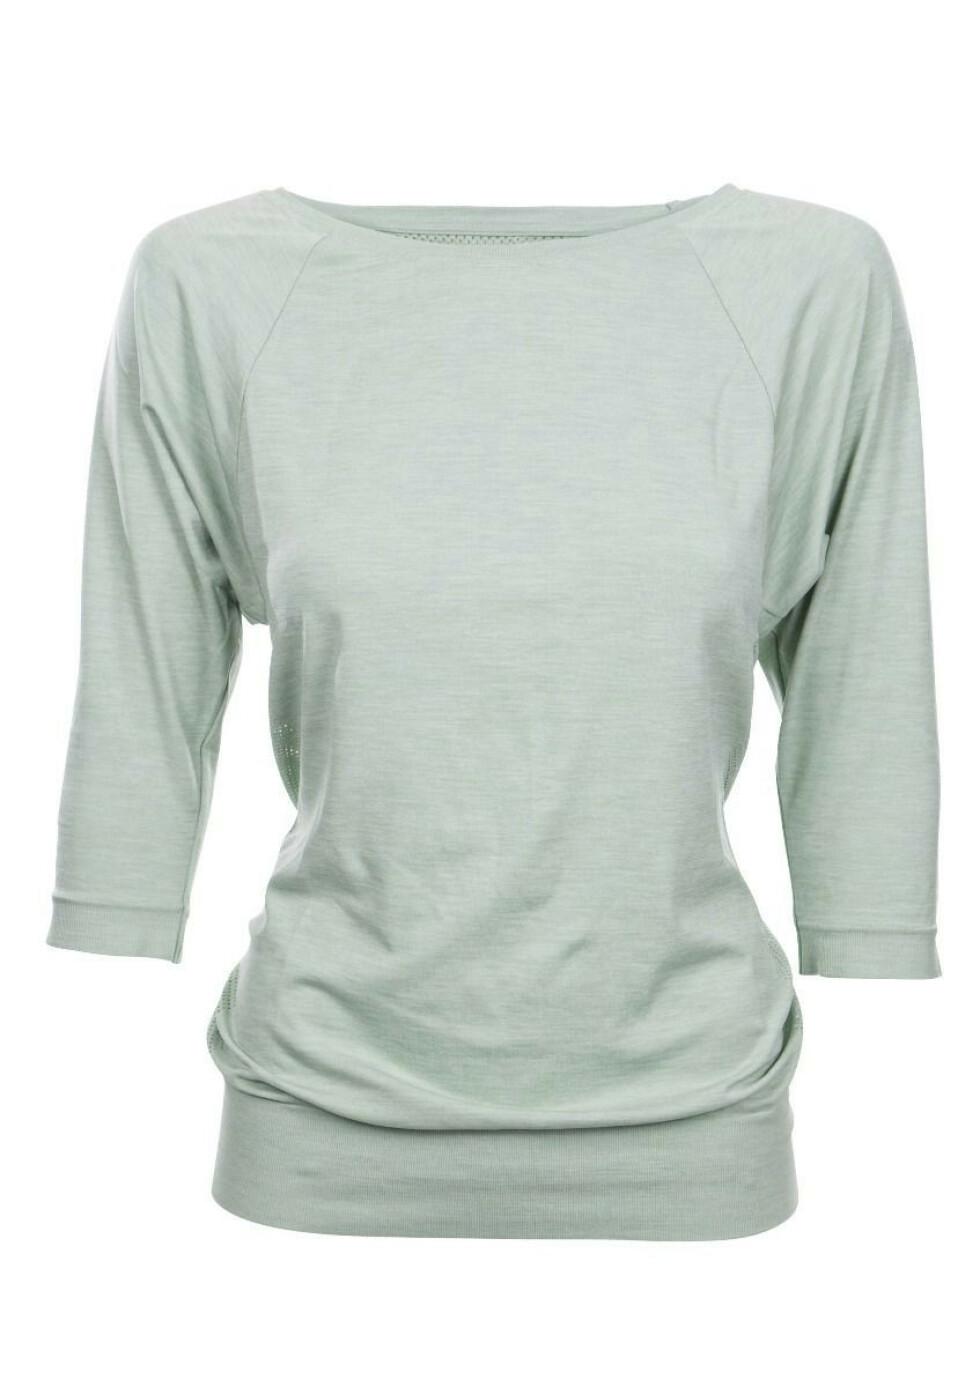 Mintgrønn trøye (kr 700, Run & Relax).